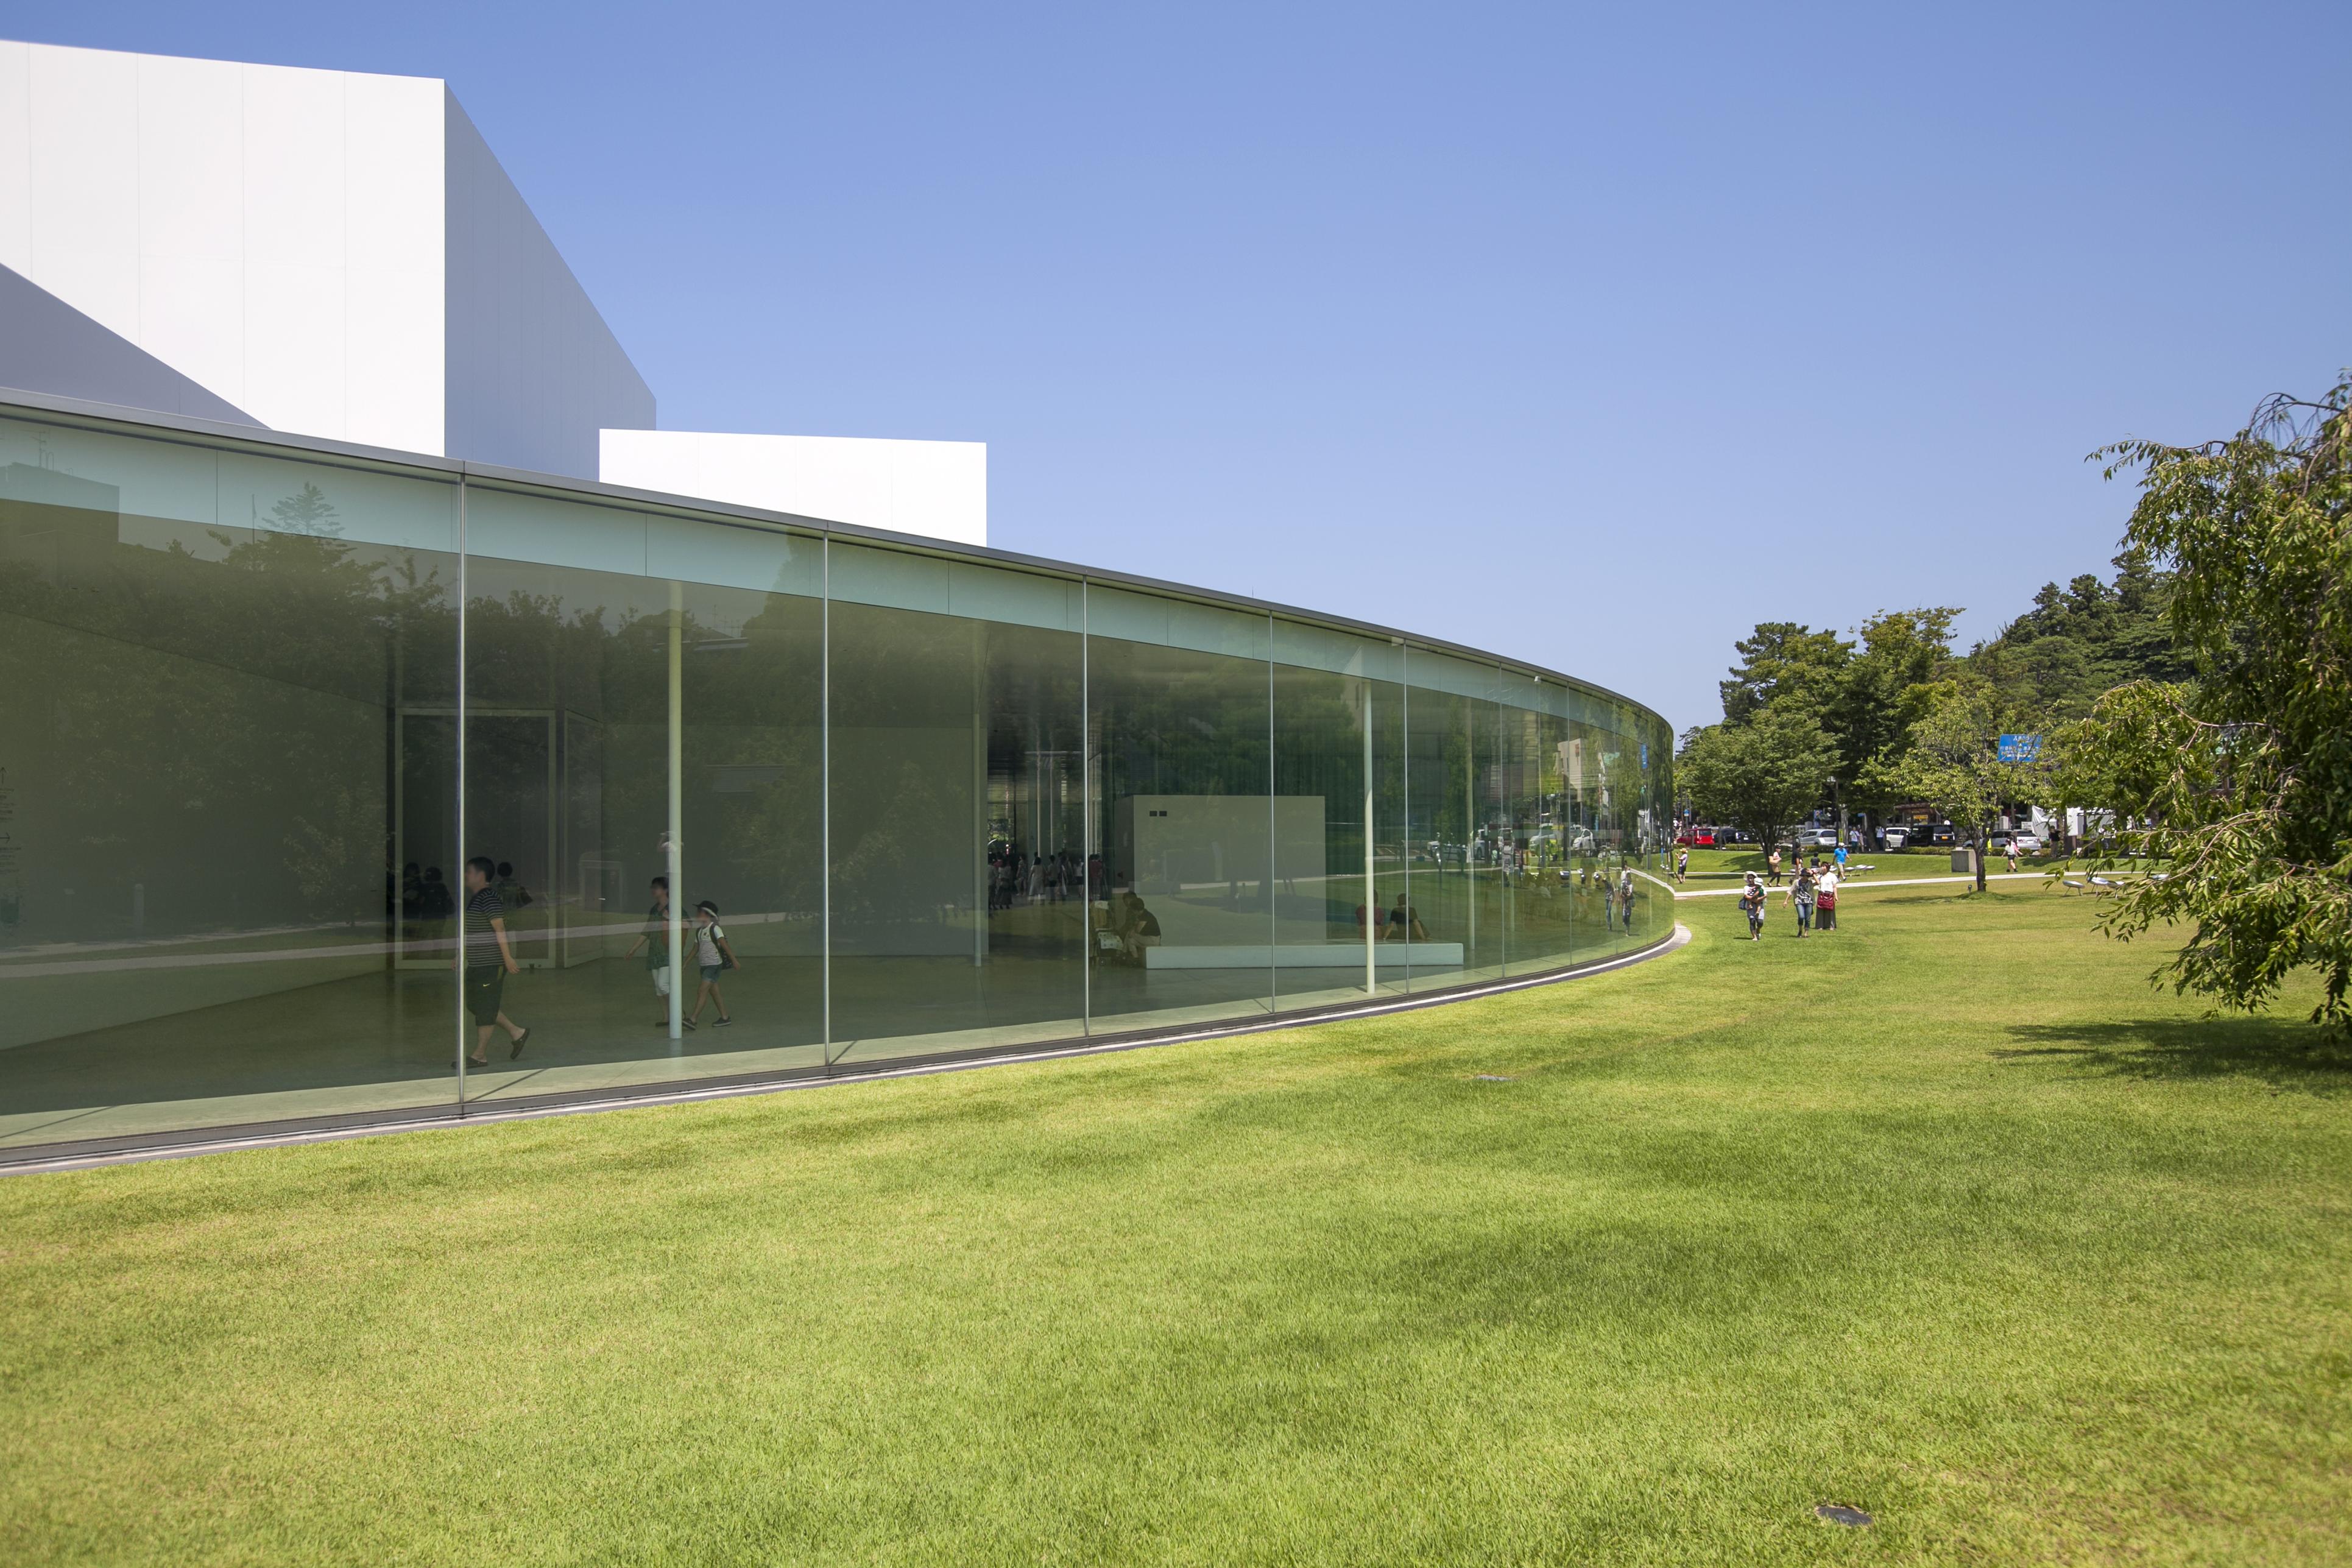 File:21st Century Museum of Contemporary Art, Kanazawa009.jpg - Wikimedia Com...